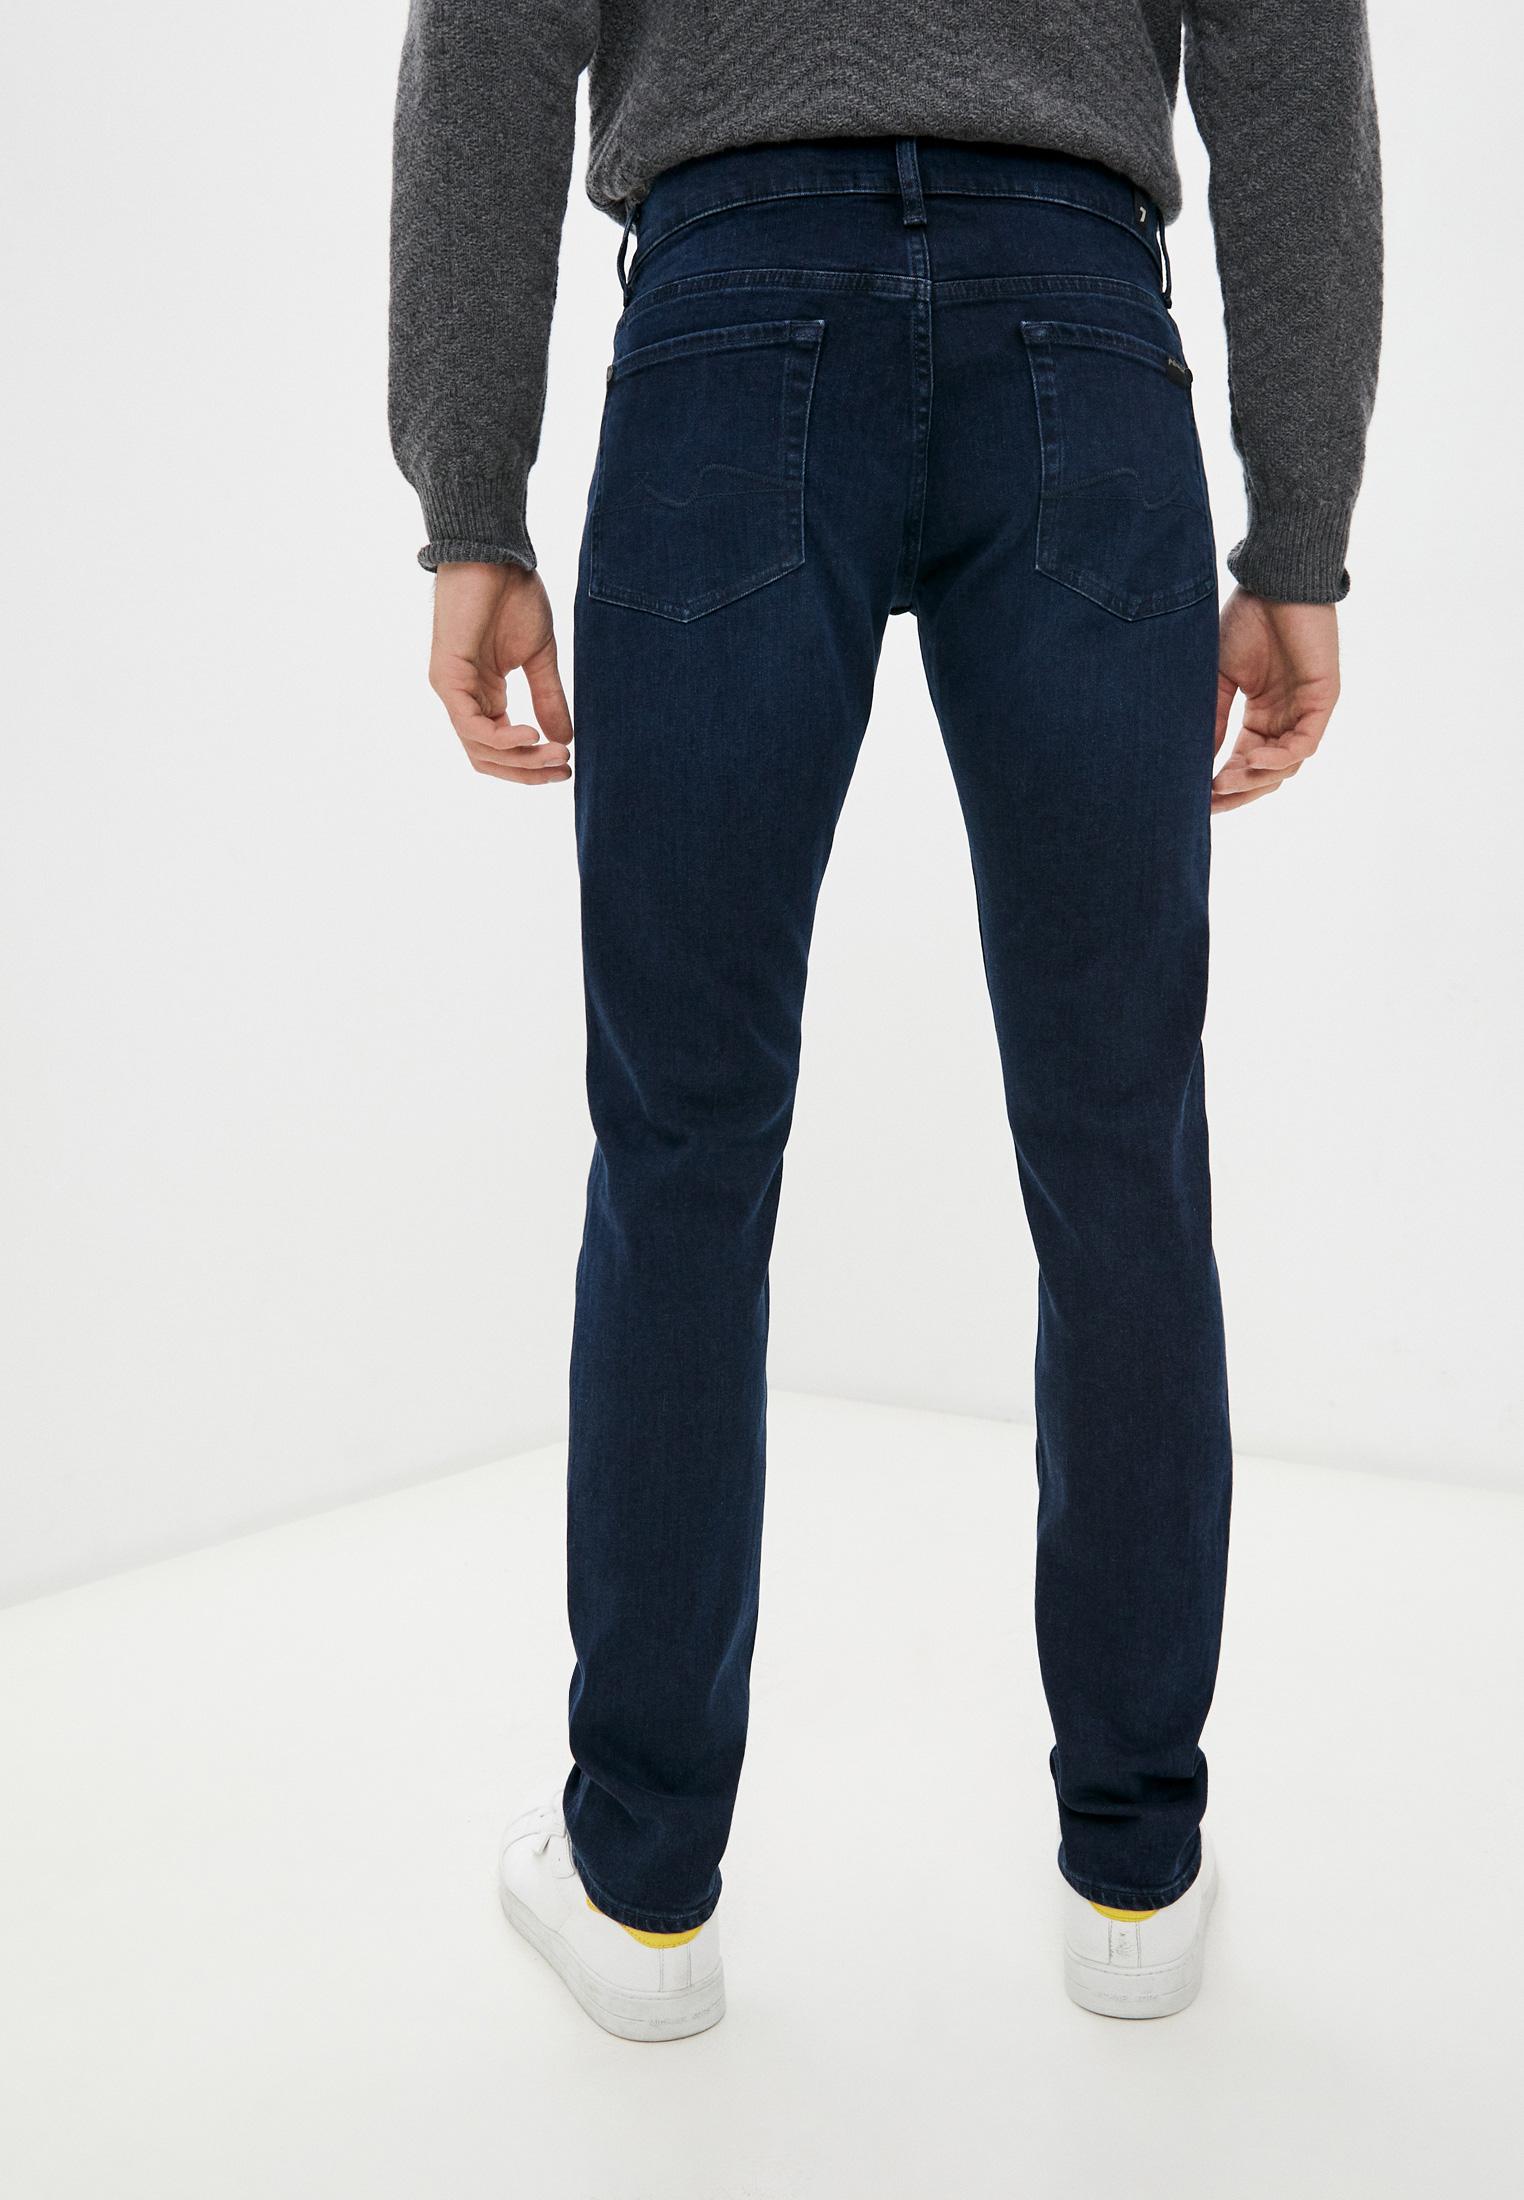 Зауженные джинсы 7 For All Mankind (7 Фо Олл Мэнкайнд) JSD4R460LL: изображение 4